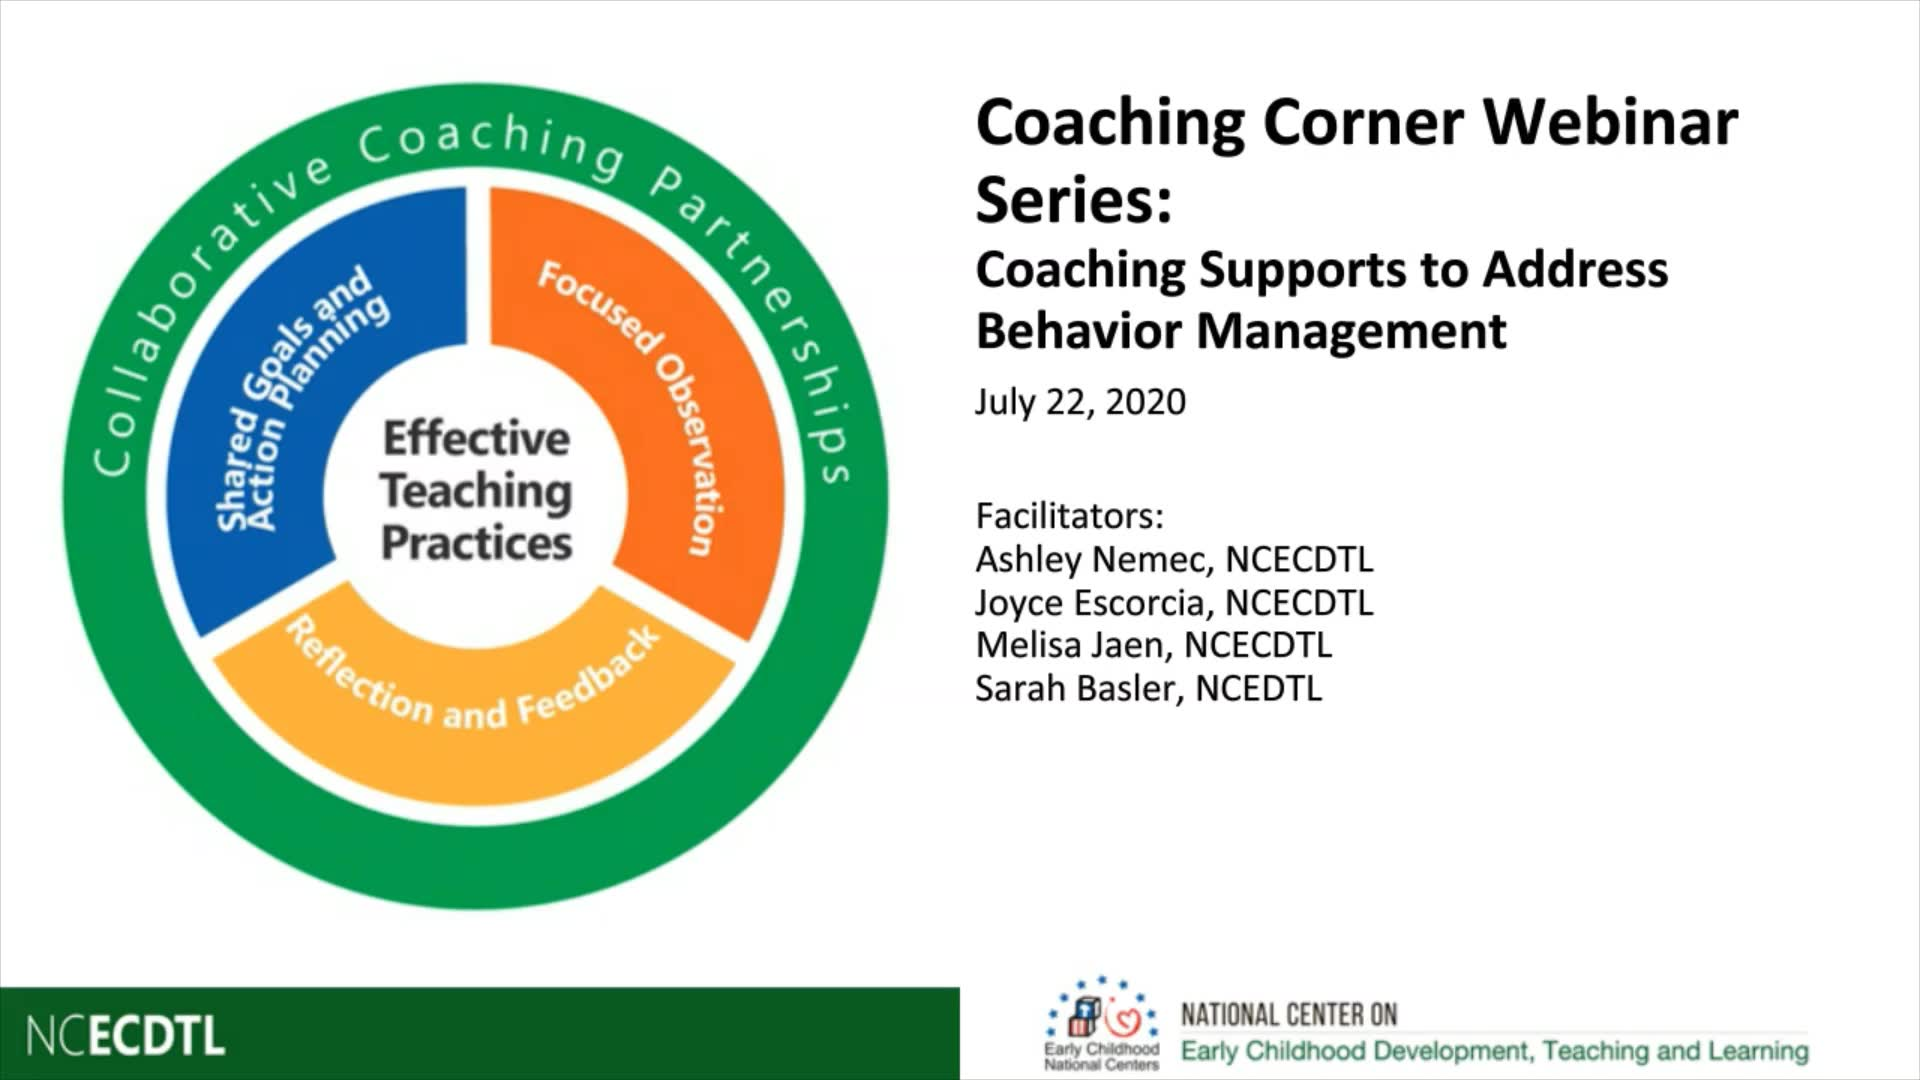 Coaching Supports to Address Behavior Management